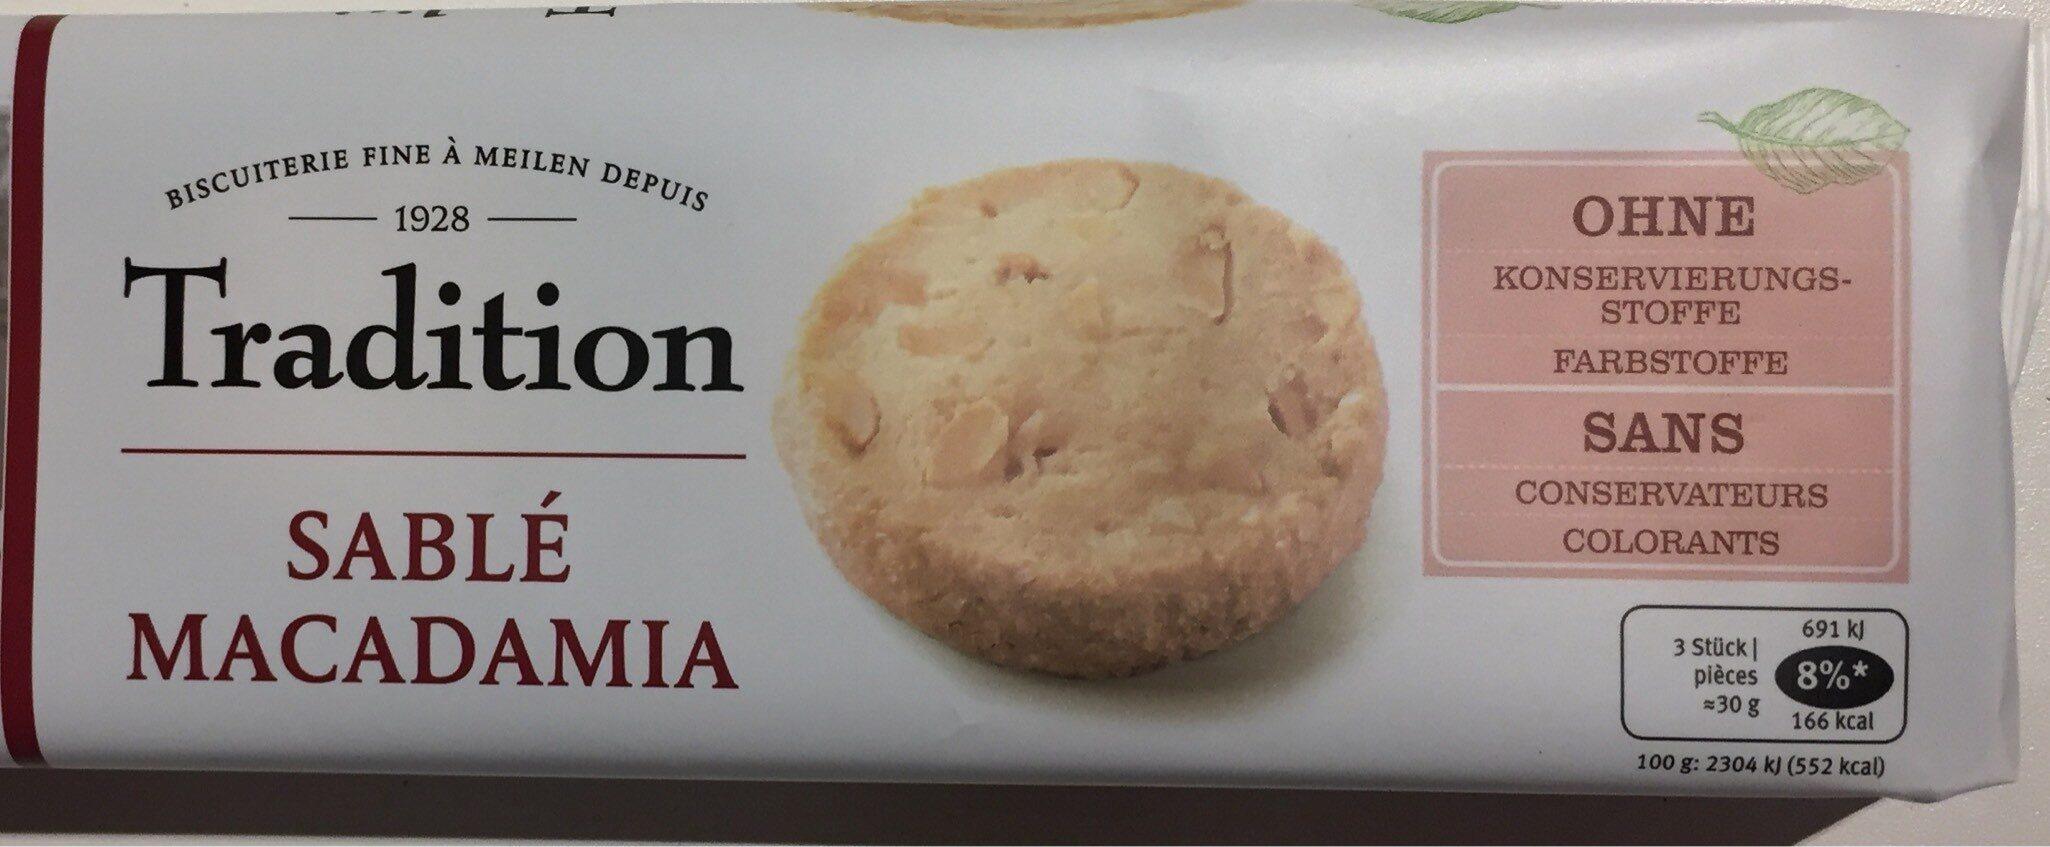 Tradition Sablé macadamia - Product - fr